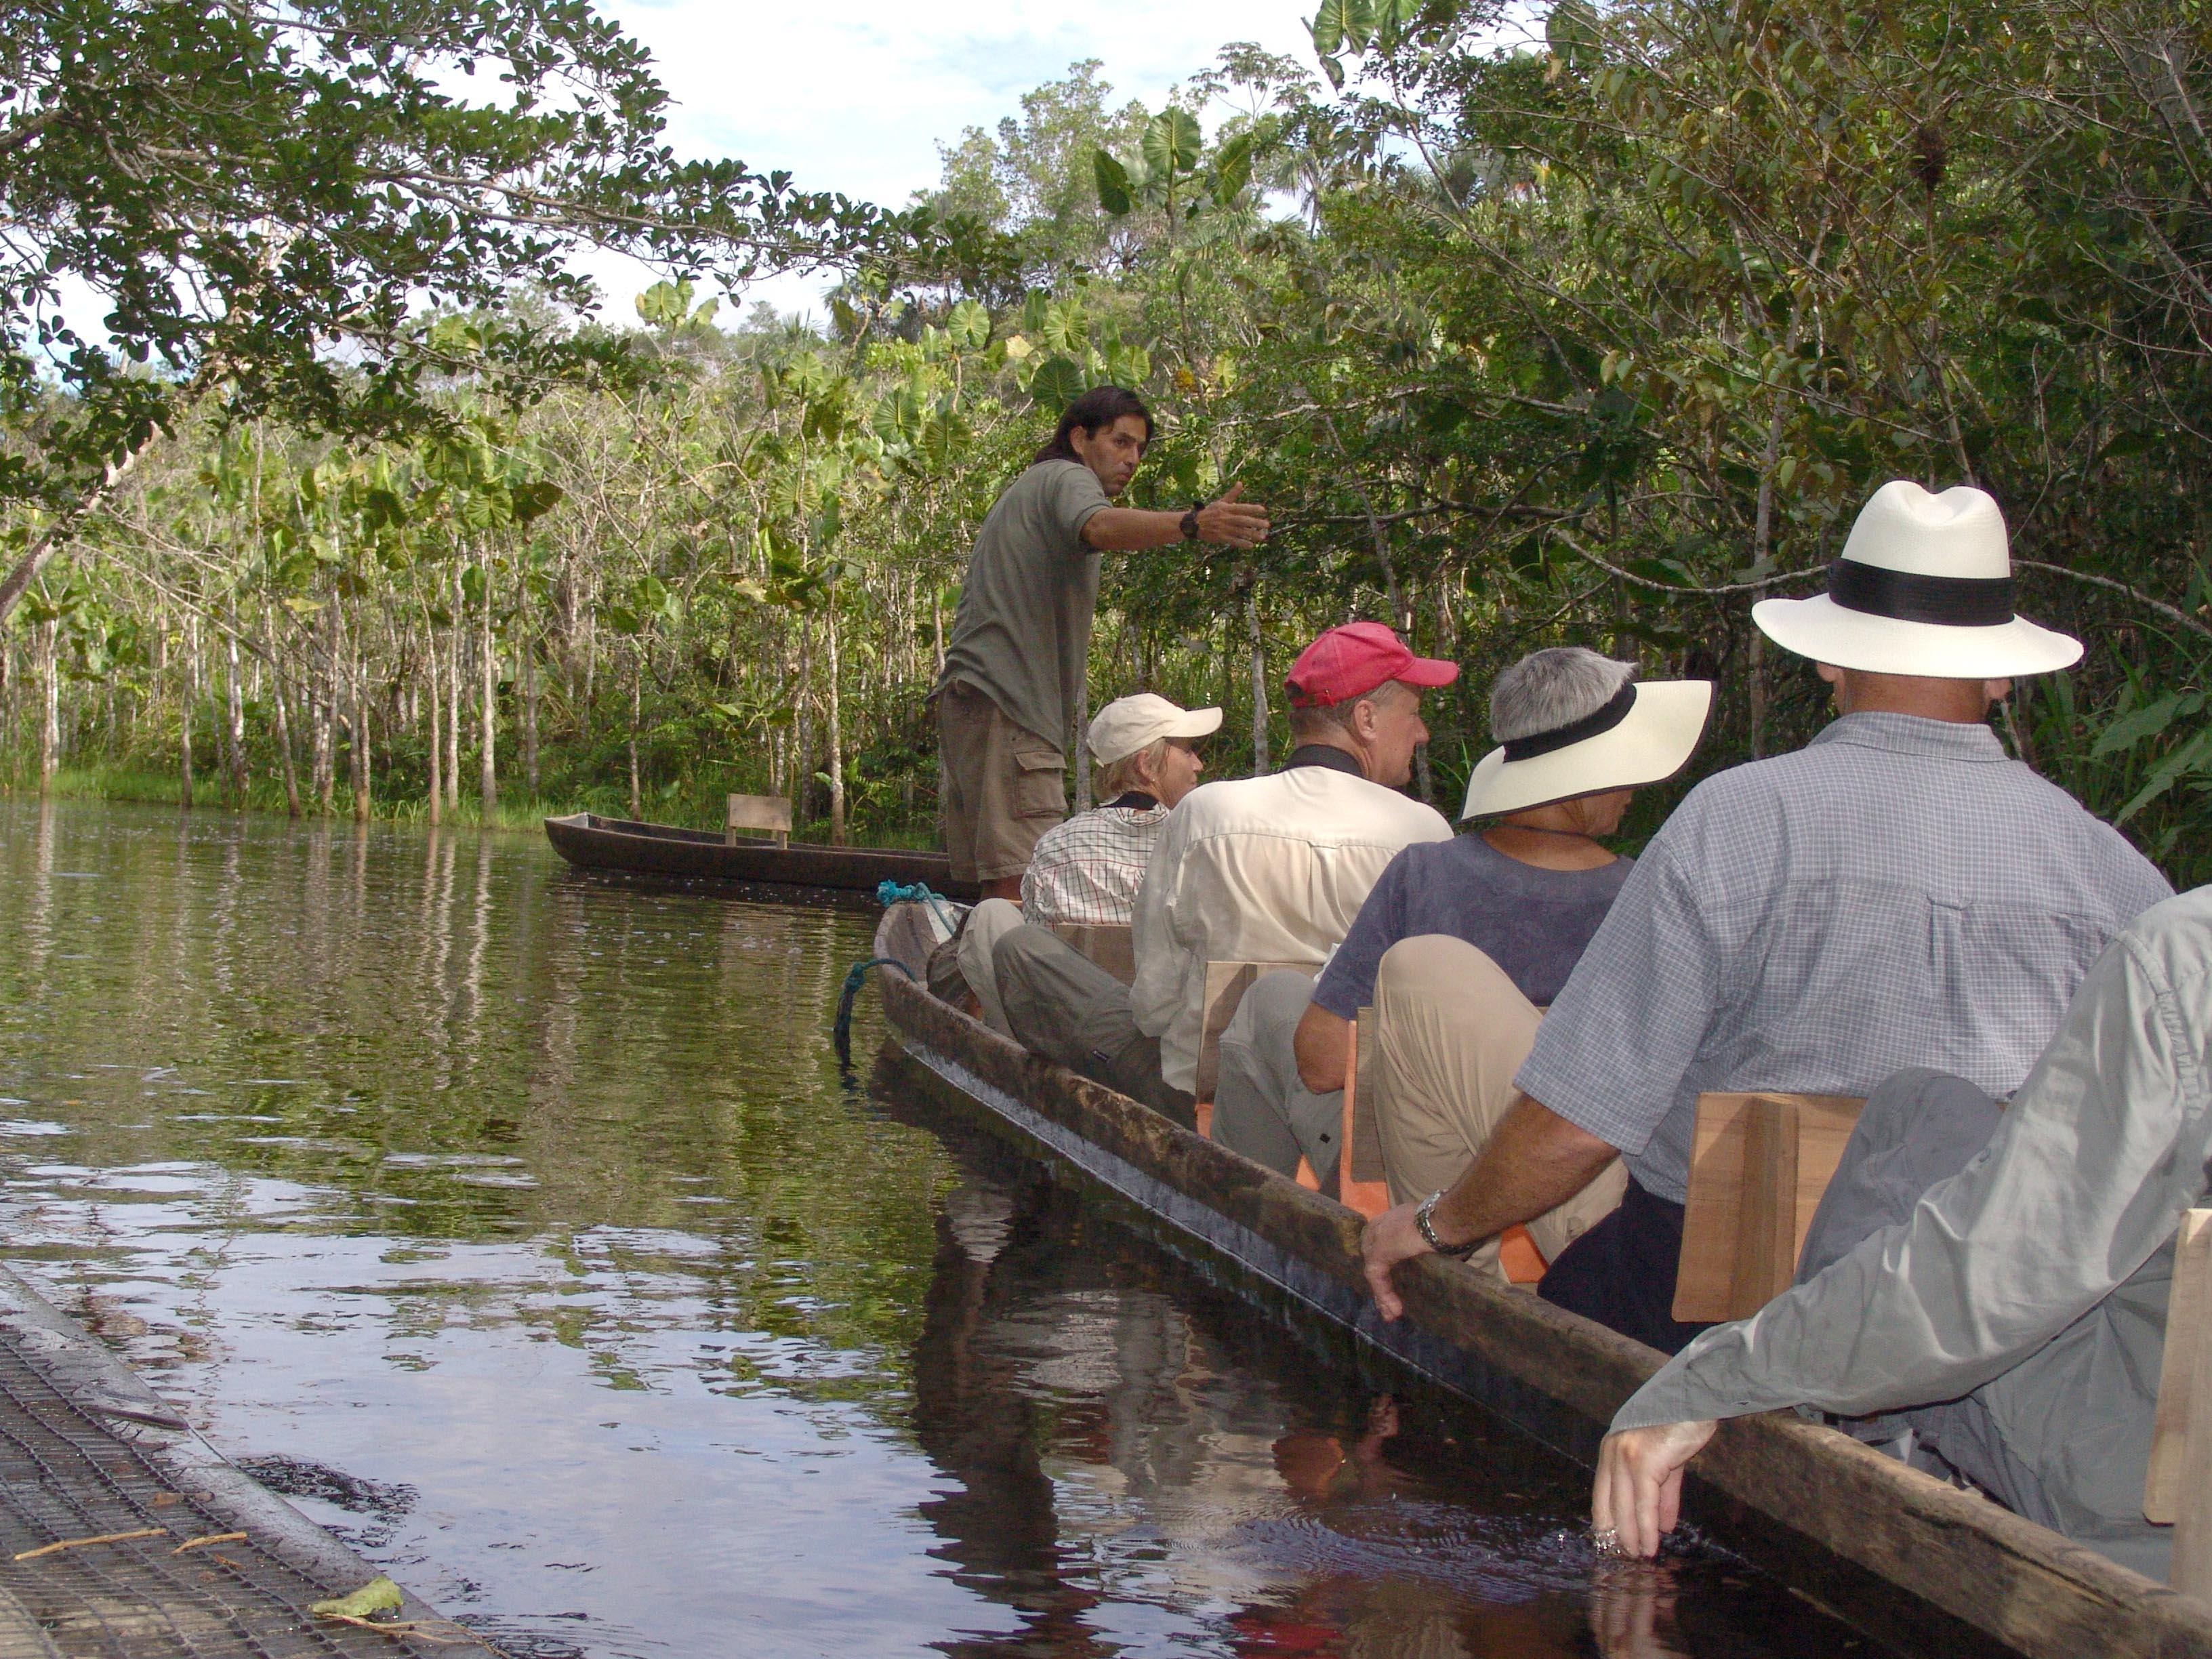 Ecuador: Amazon Jungle Experience - Independent 1